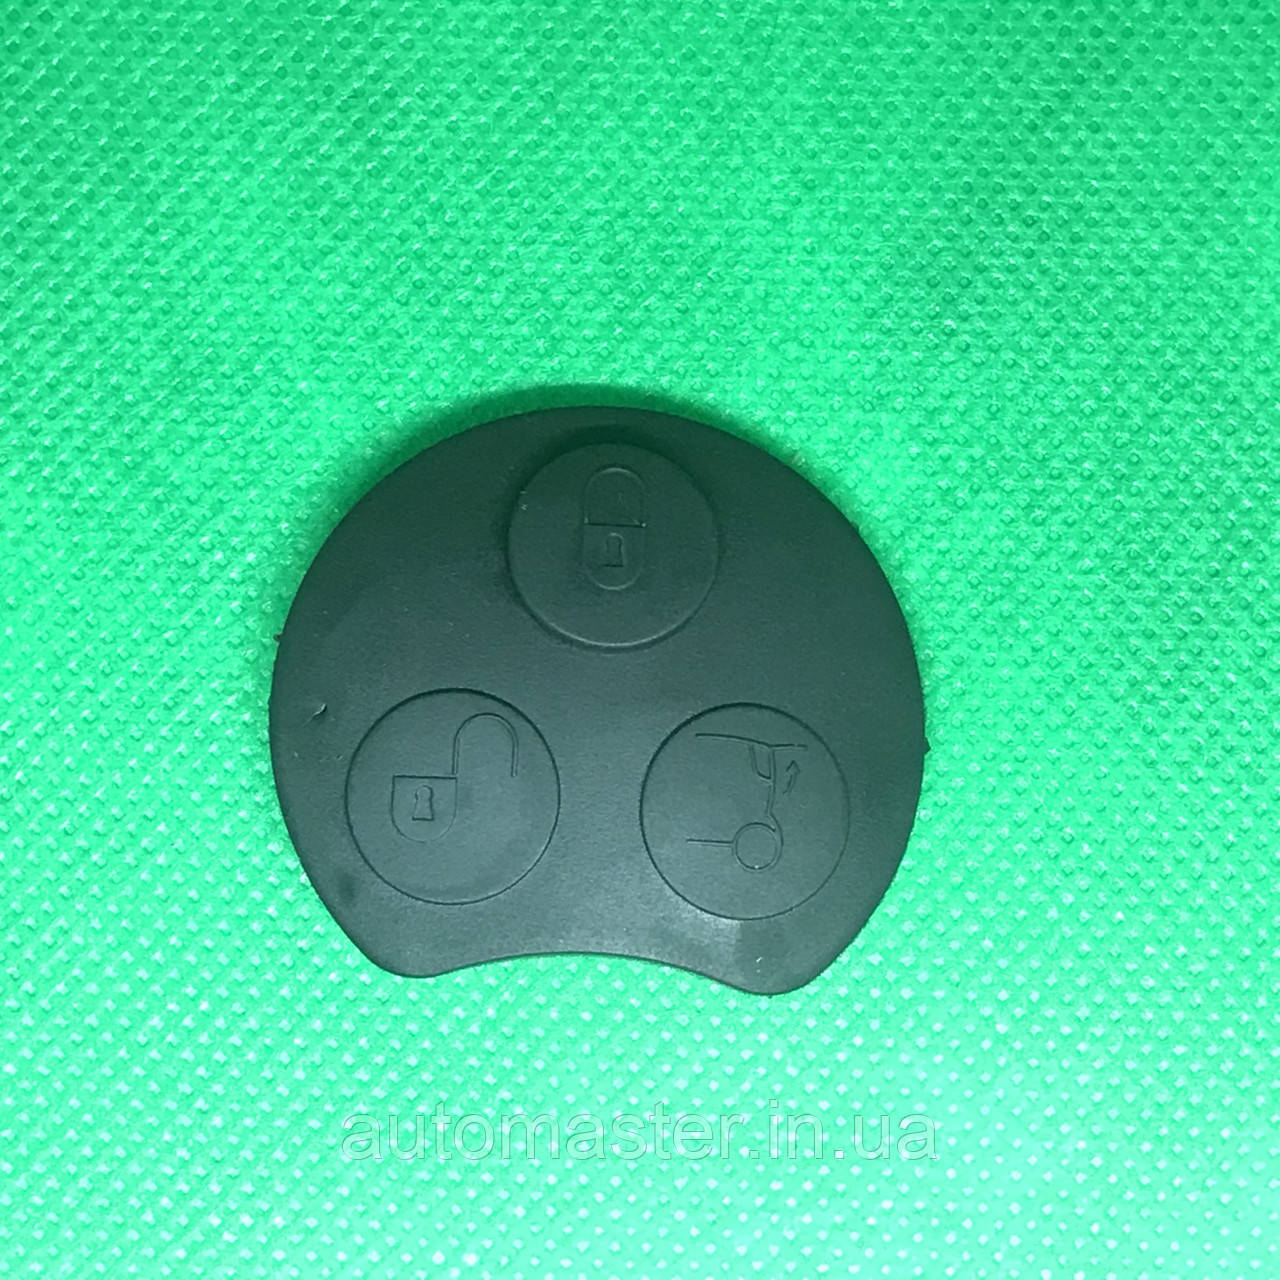 Кнопки ключа Mercedes Smart (Мерседес Смарт) - 3 кнопки